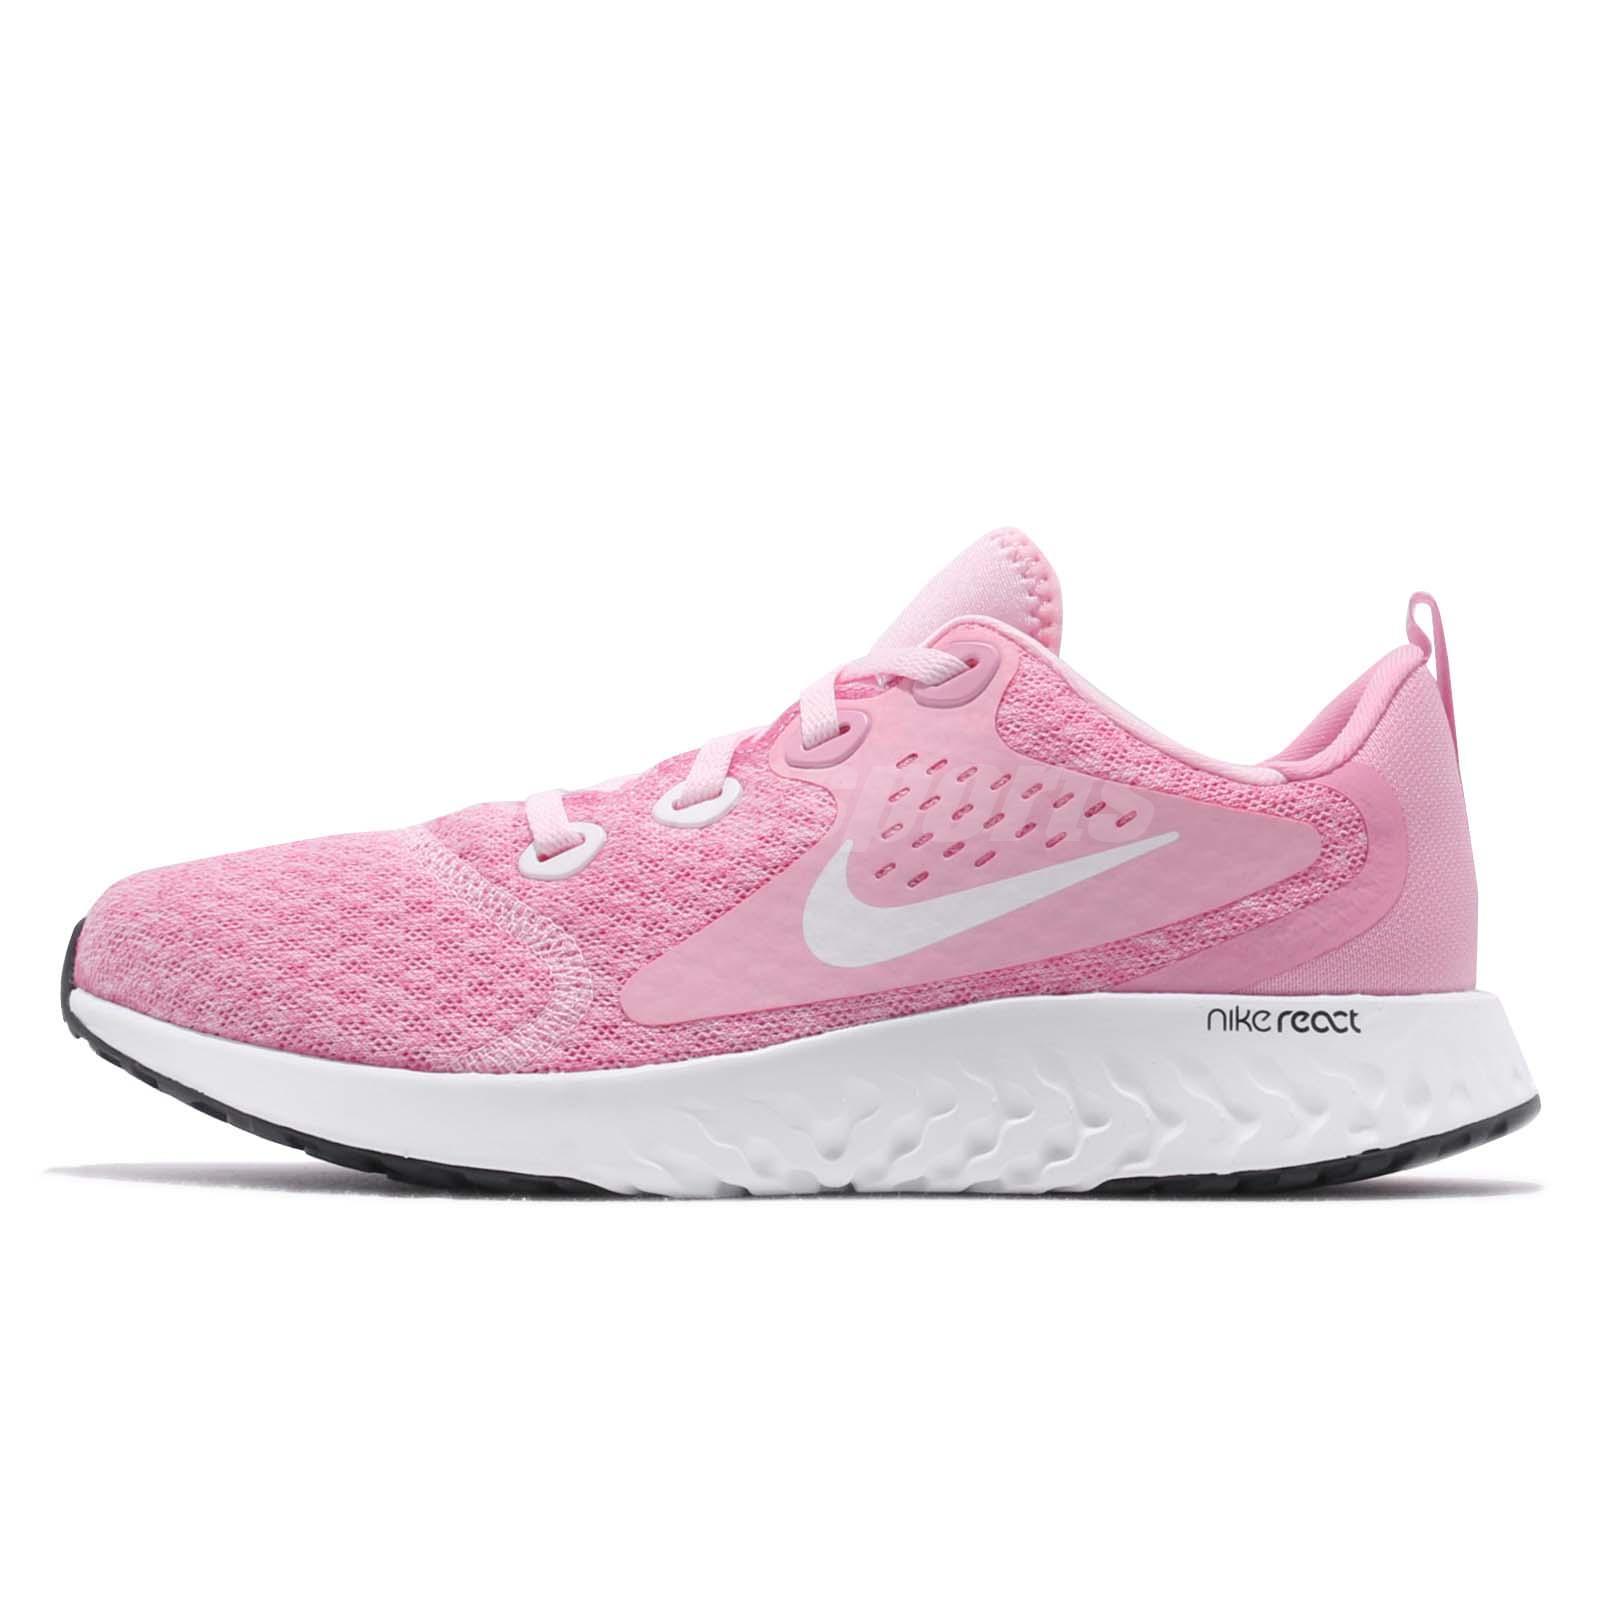 Pink Legend Running Gs Youth Shoes React White Kid Women Nike 08wmOyNvn